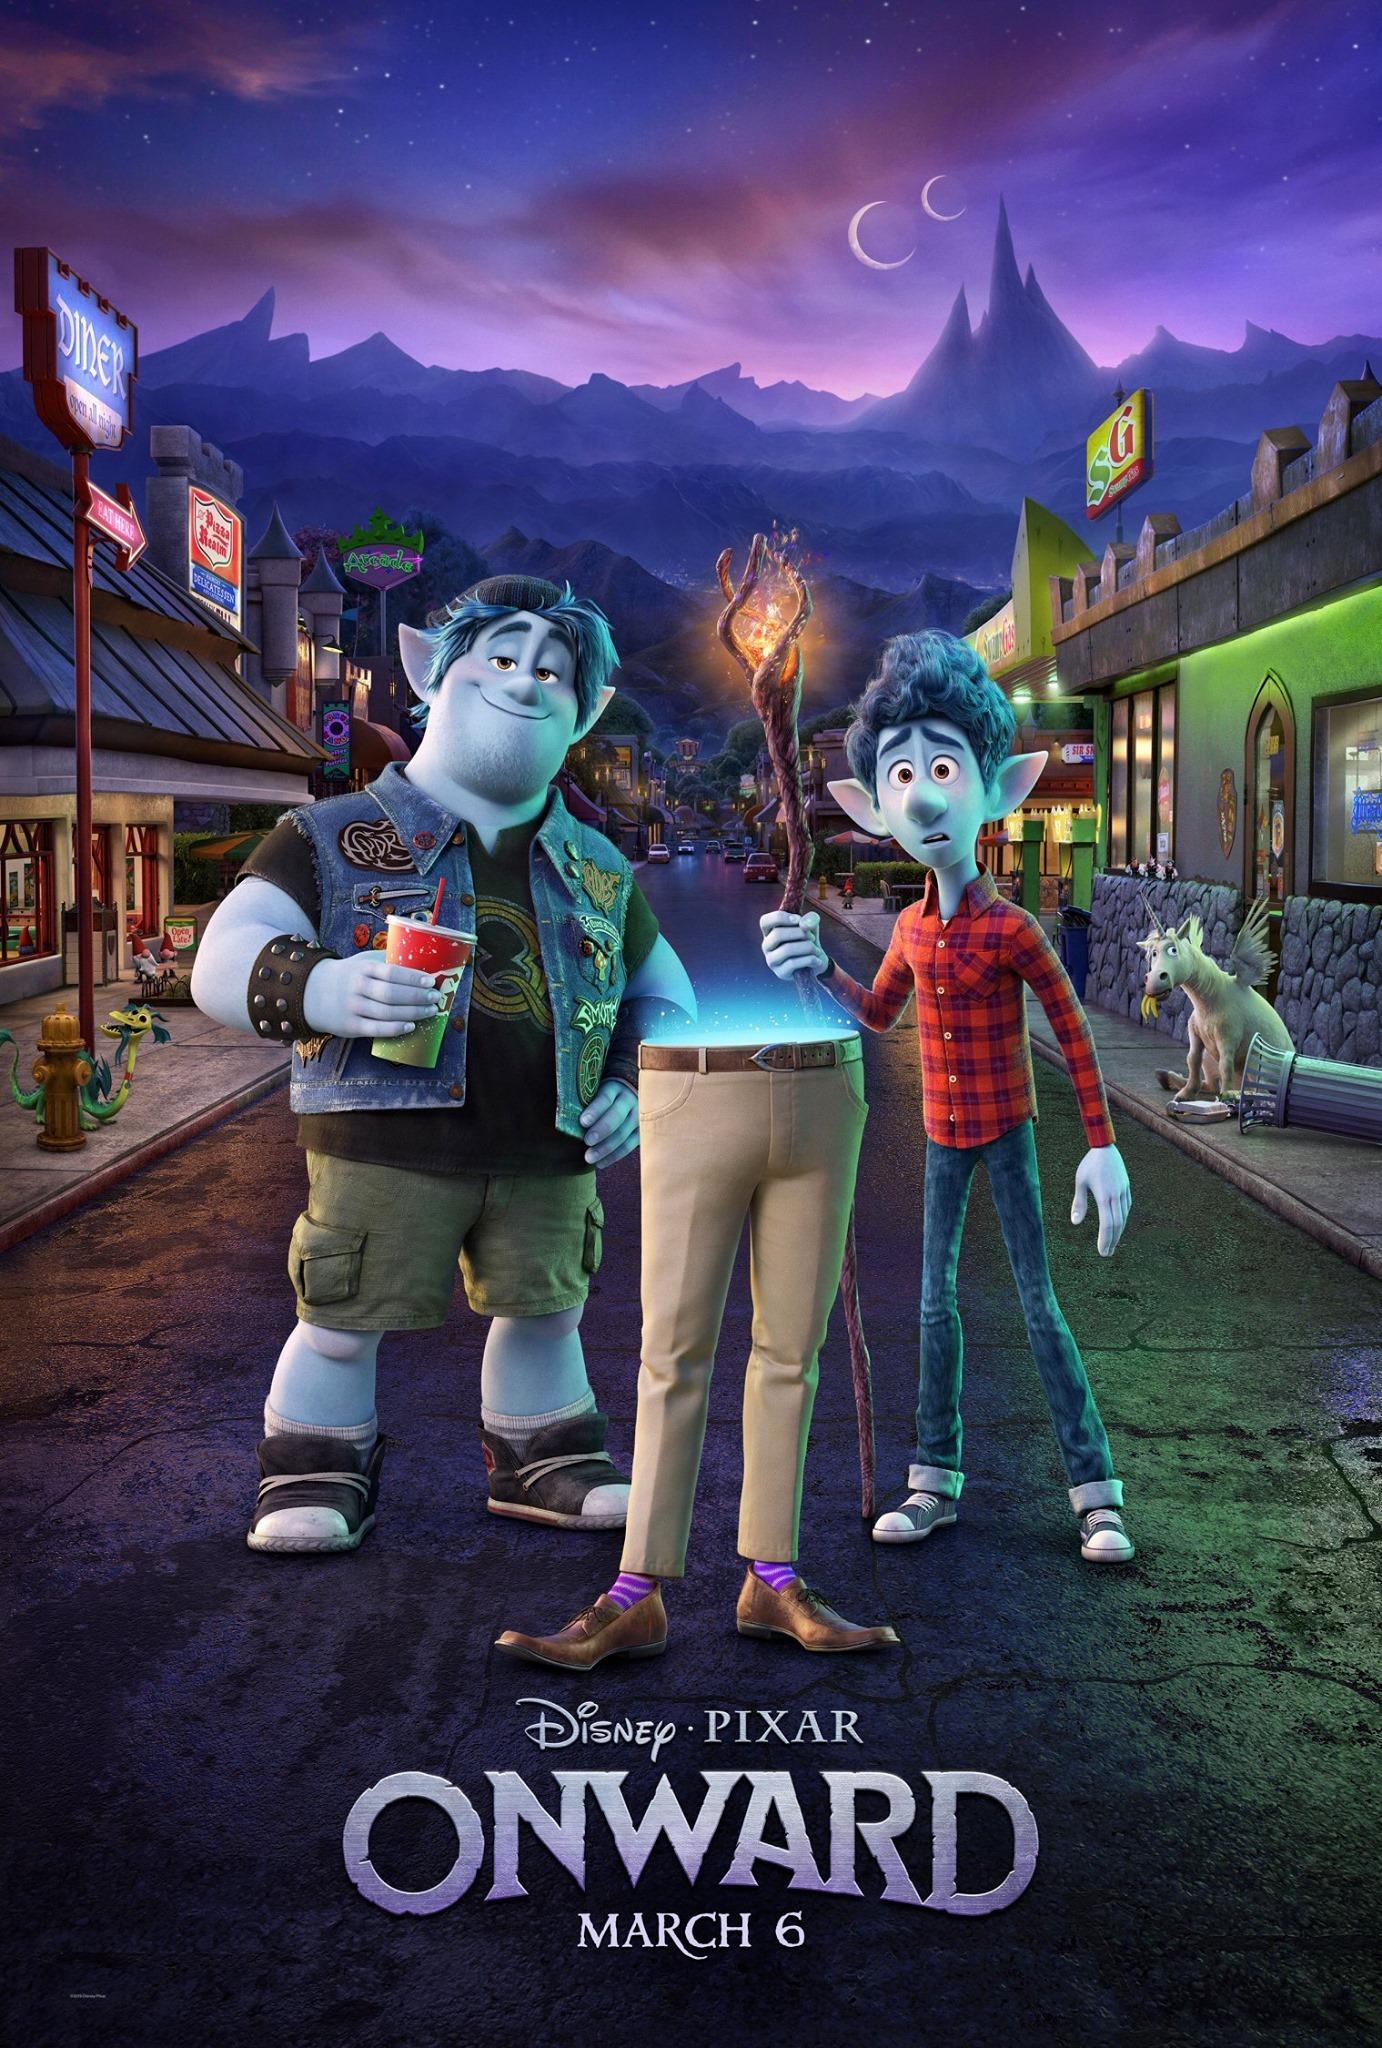 szmk_onward_pixar_elore_1.jpg